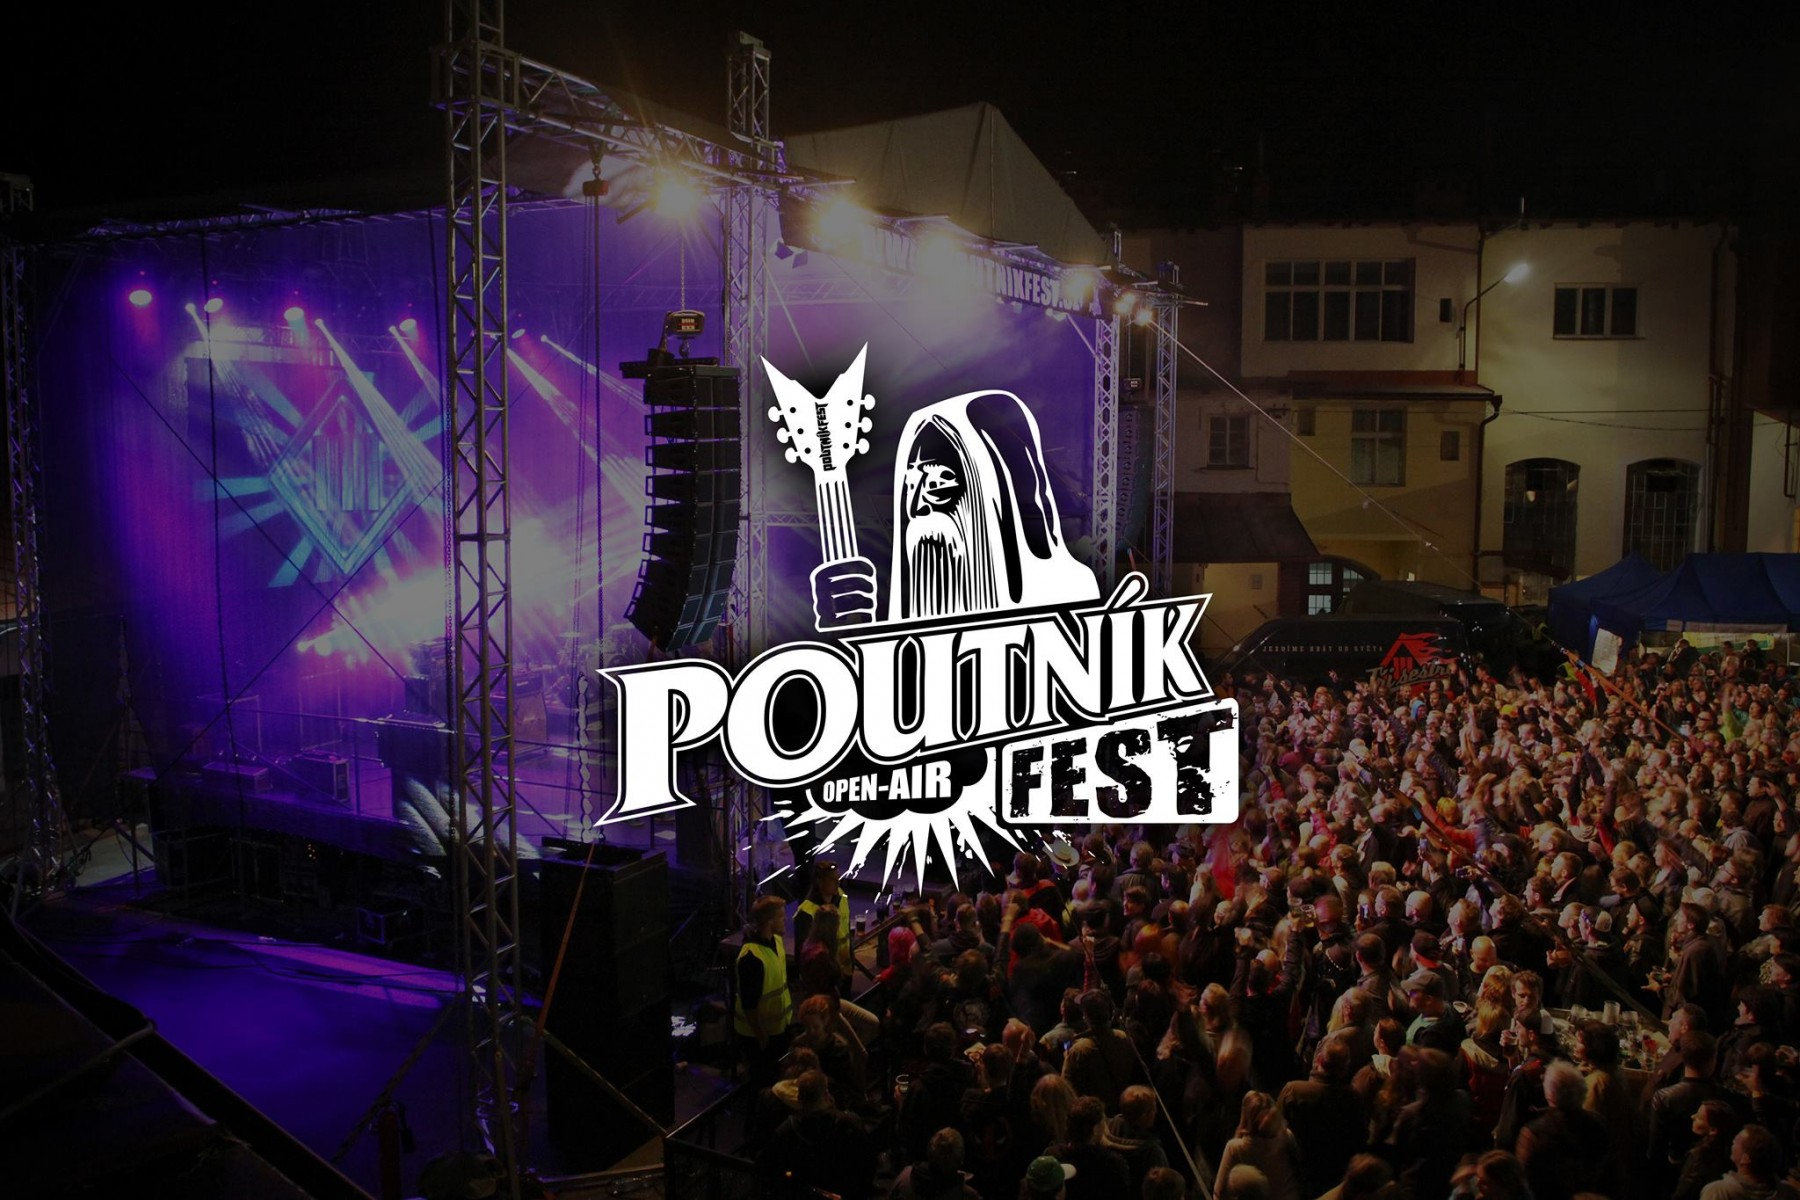 pivovari-pivovary-pivni-akce-pivovar-poutnik-poutnikfest-2019